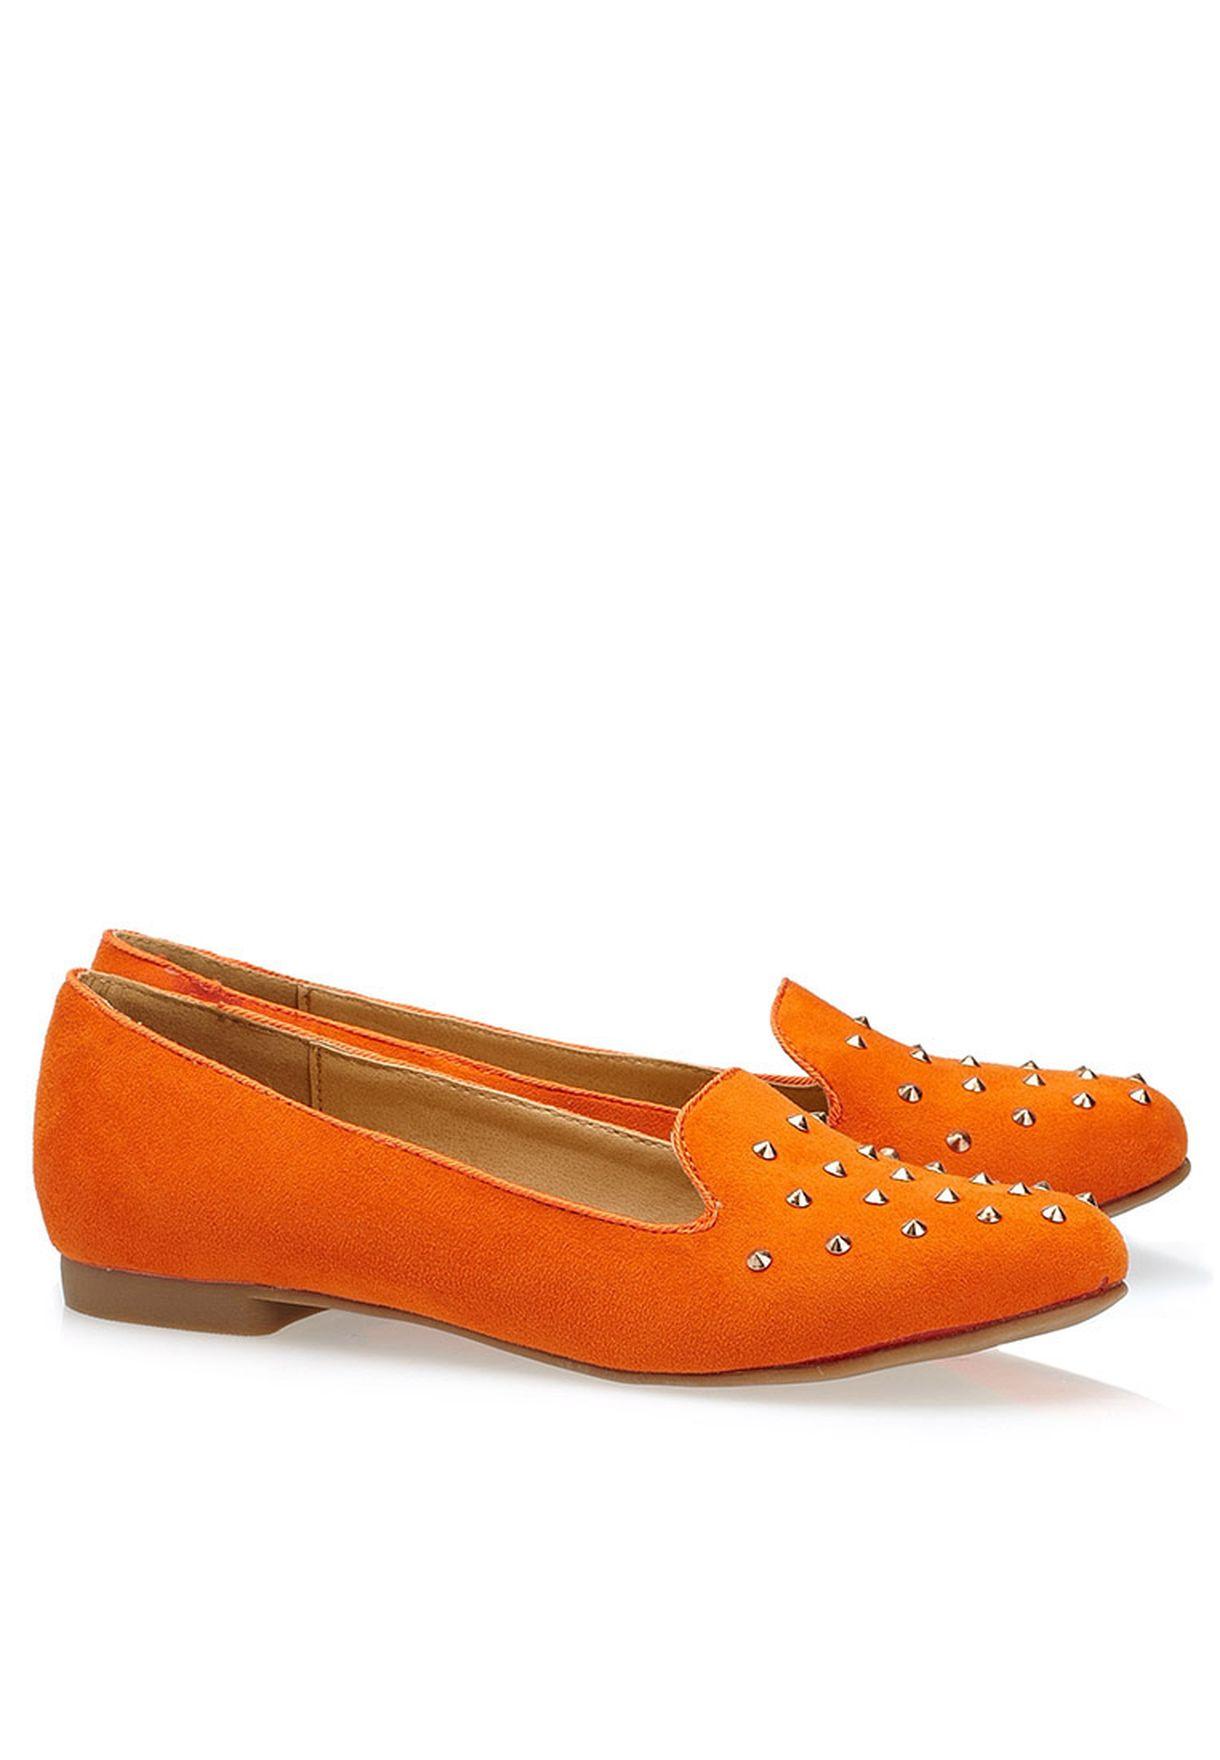 4b08cf185fd Shop Even odd orange Studded Loafers for Women in Oman - EV477SH25ABU